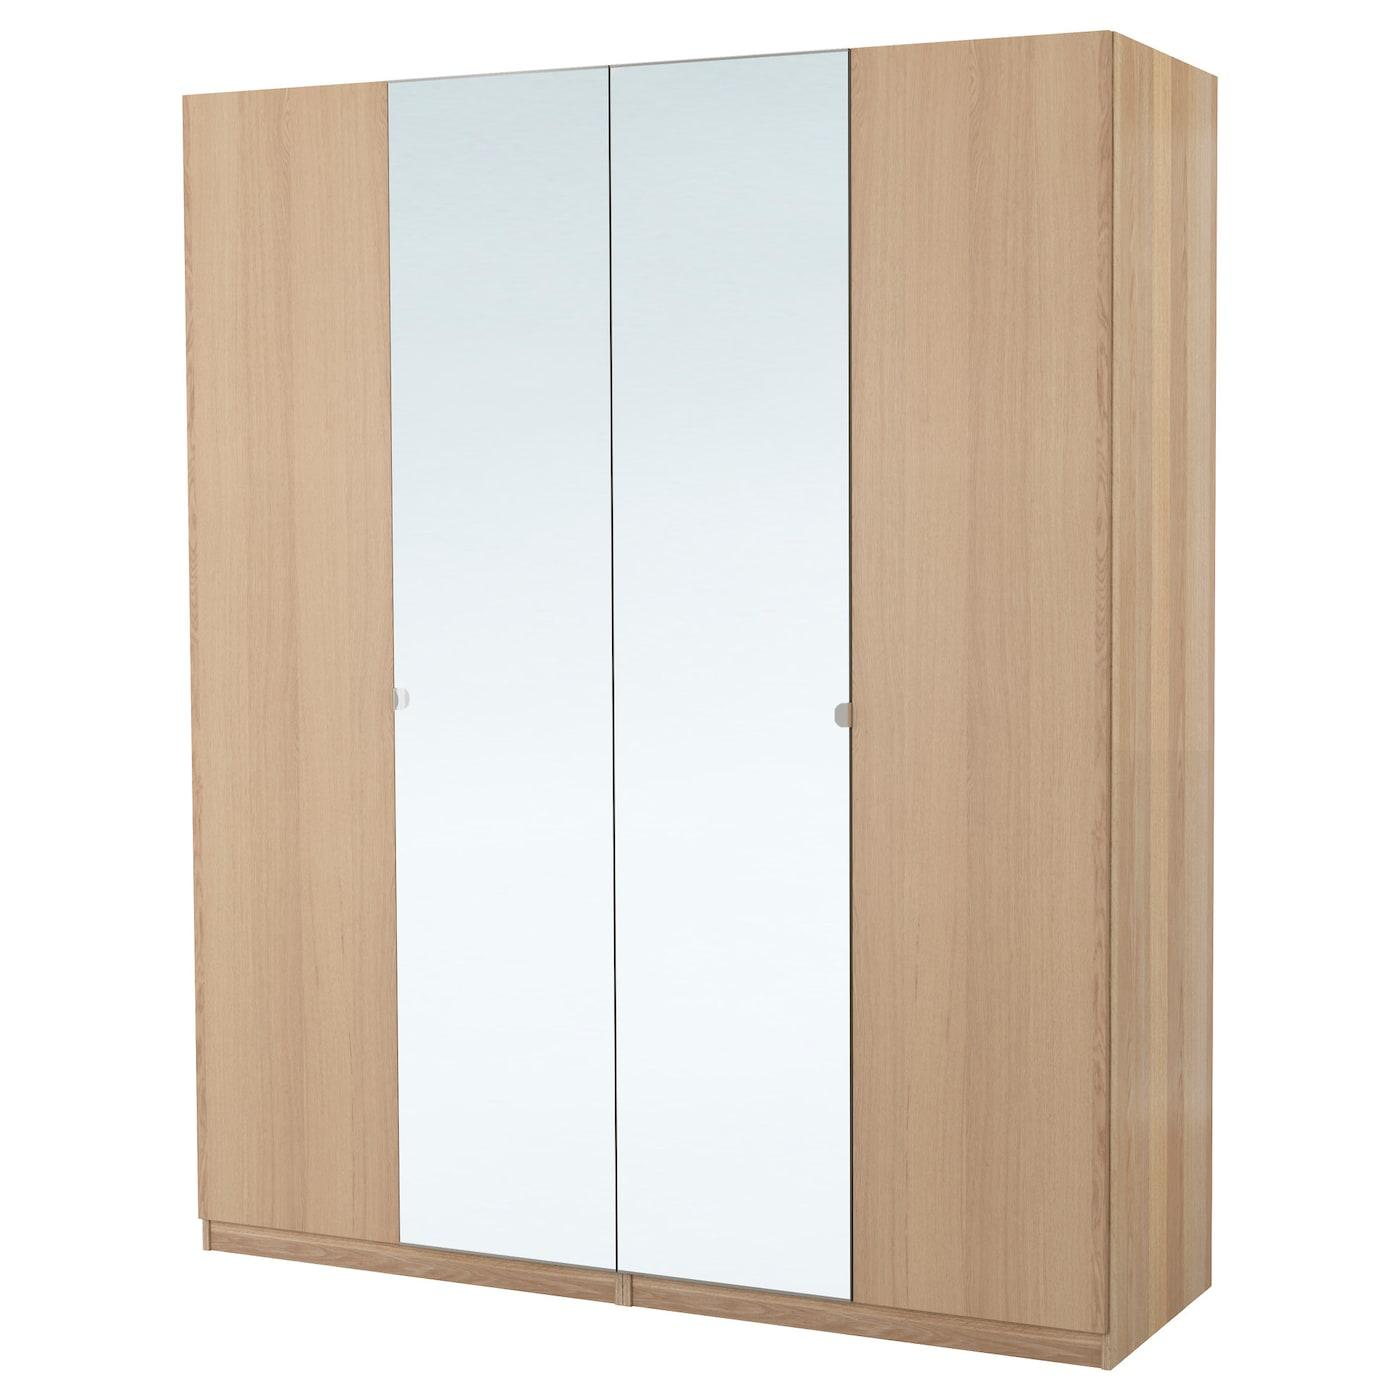 pax armoire penderie effet ch ne blanchi nexus vikedal 200x60x201 cm ikea. Black Bedroom Furniture Sets. Home Design Ideas